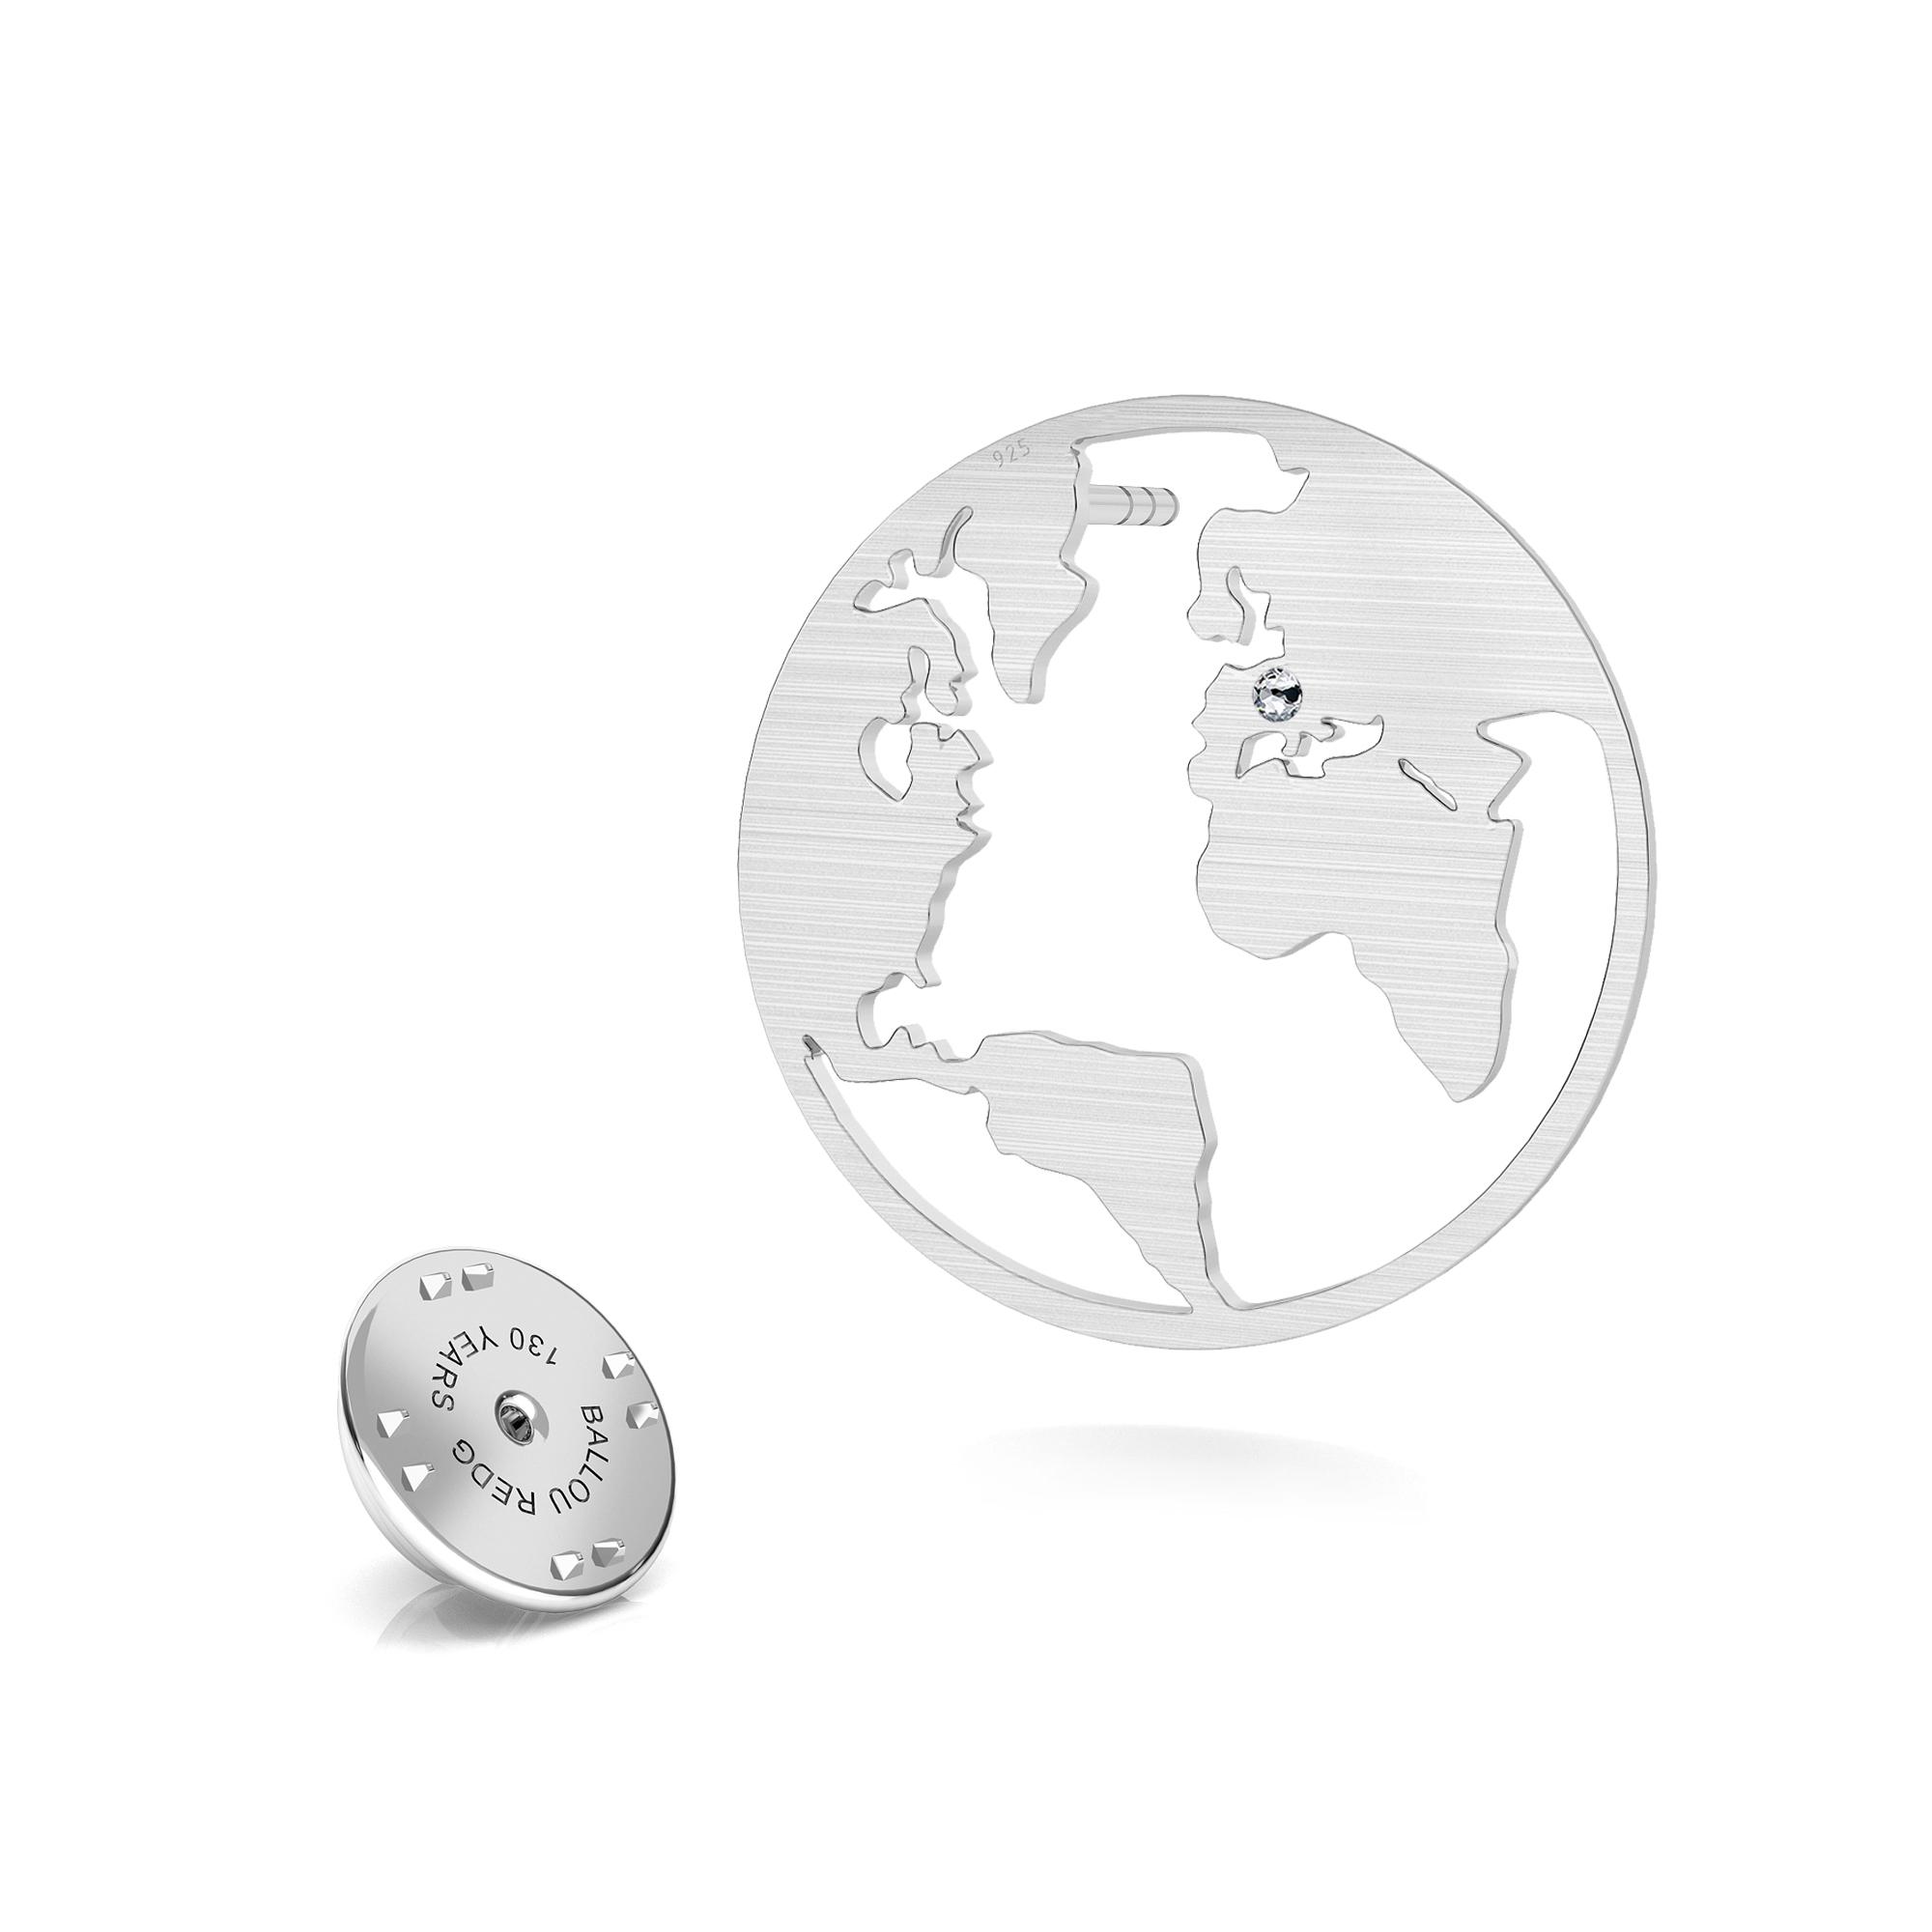 Wpinka MON DÉFI kula ziemska Swarovski satynowane srebro